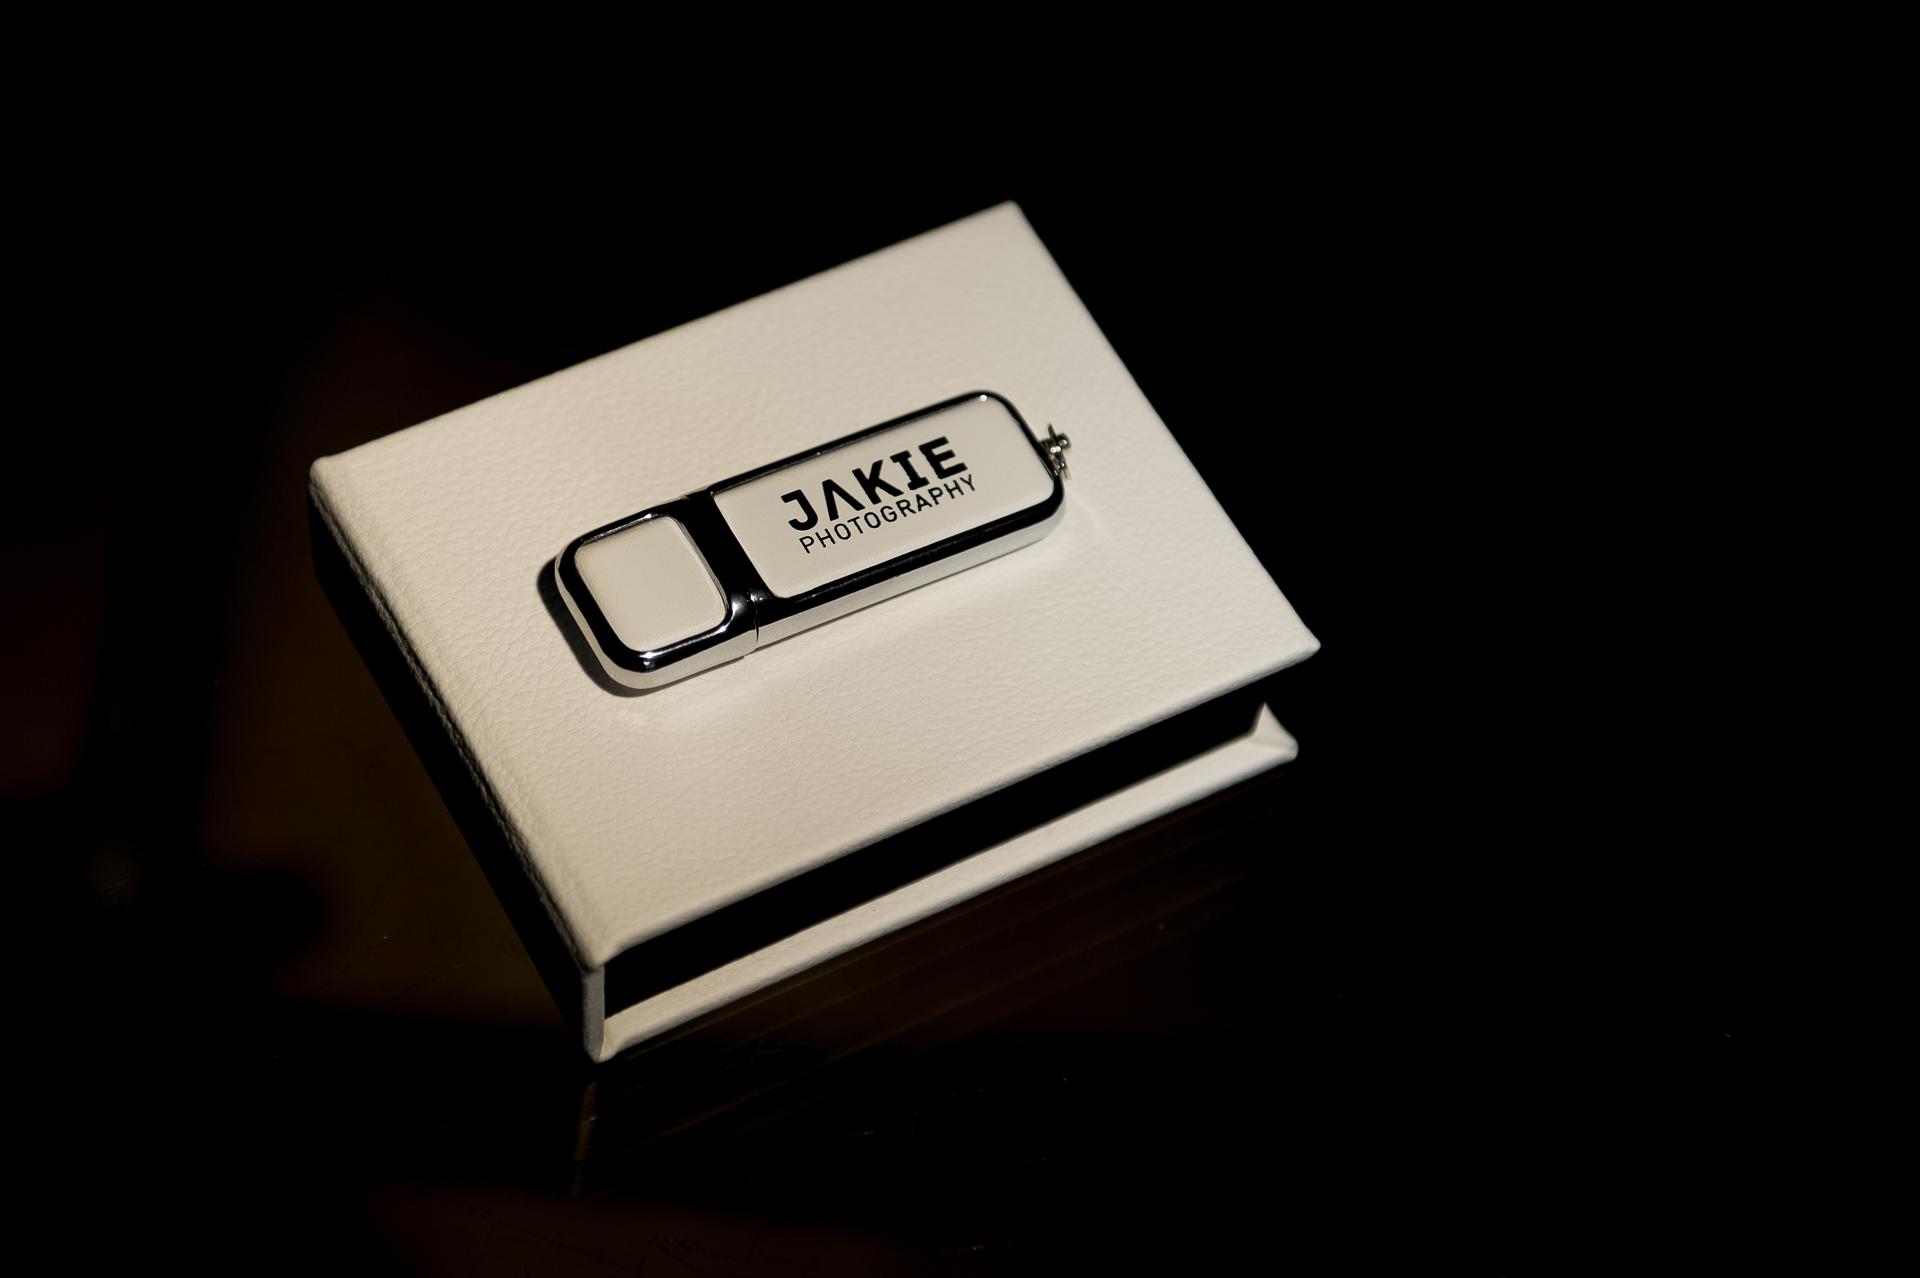 USB Flash and Box